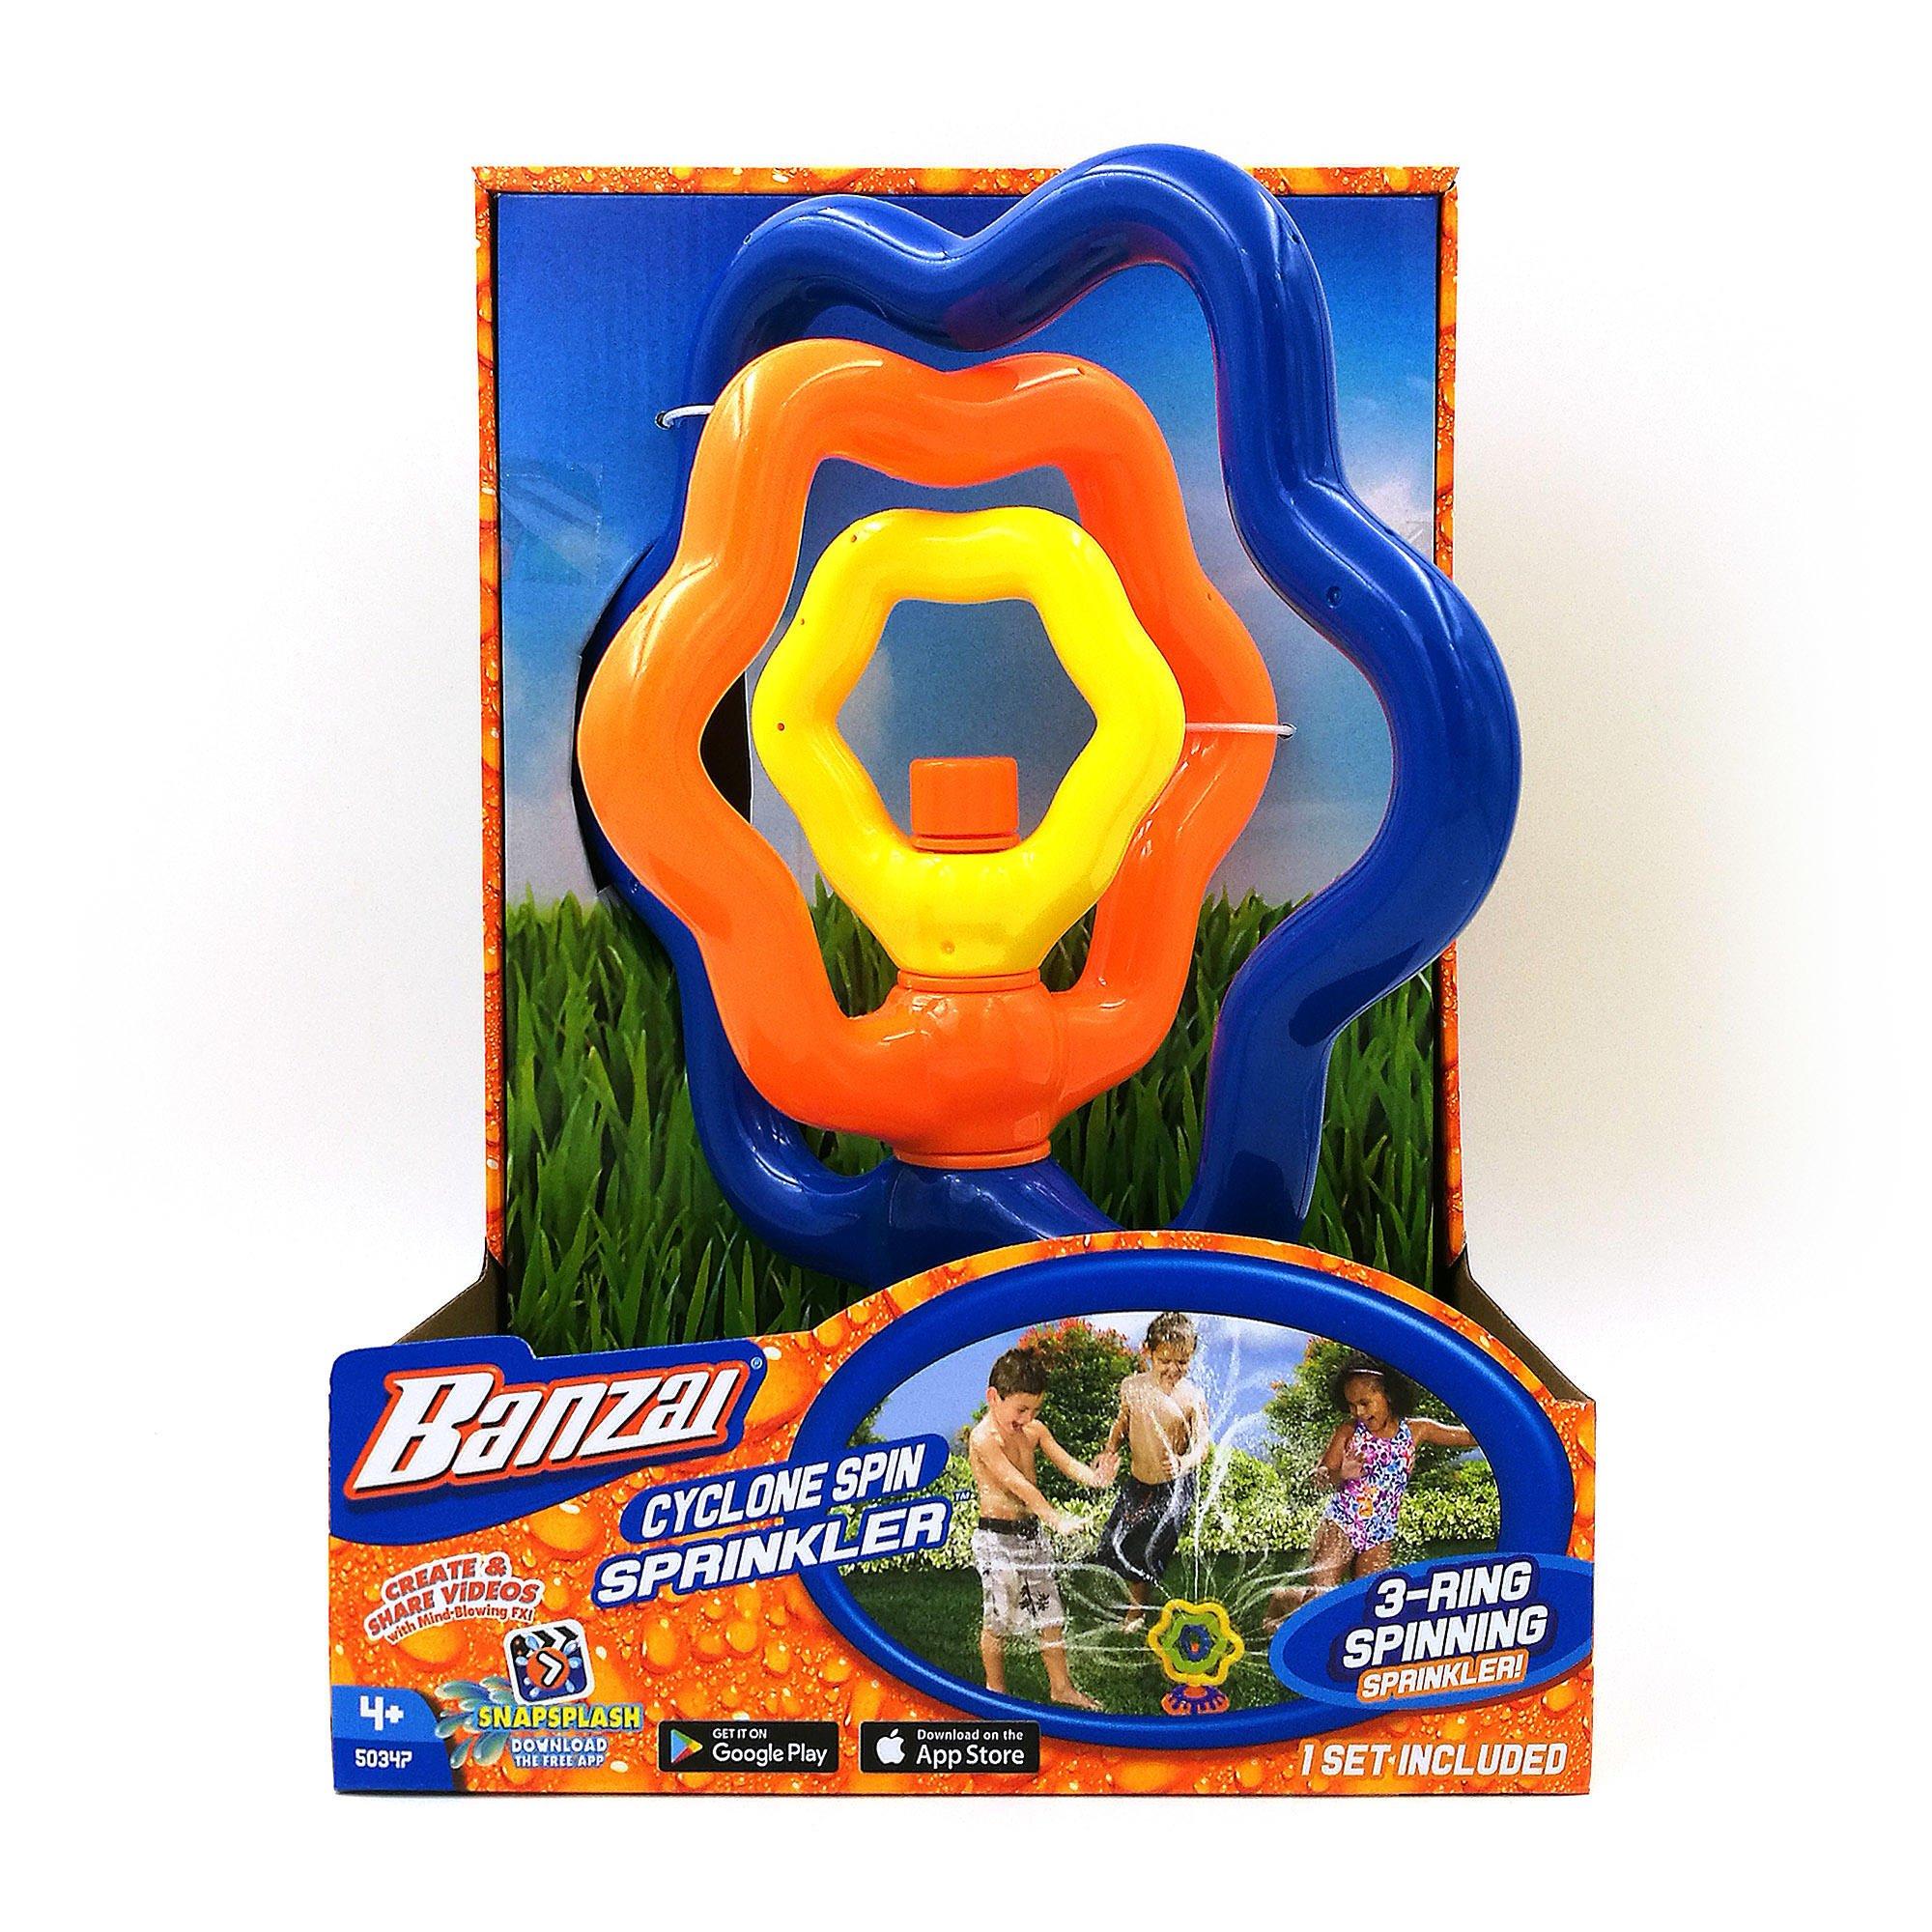 Banzai Cyclone Spin Sprinkler Water Sprinkler